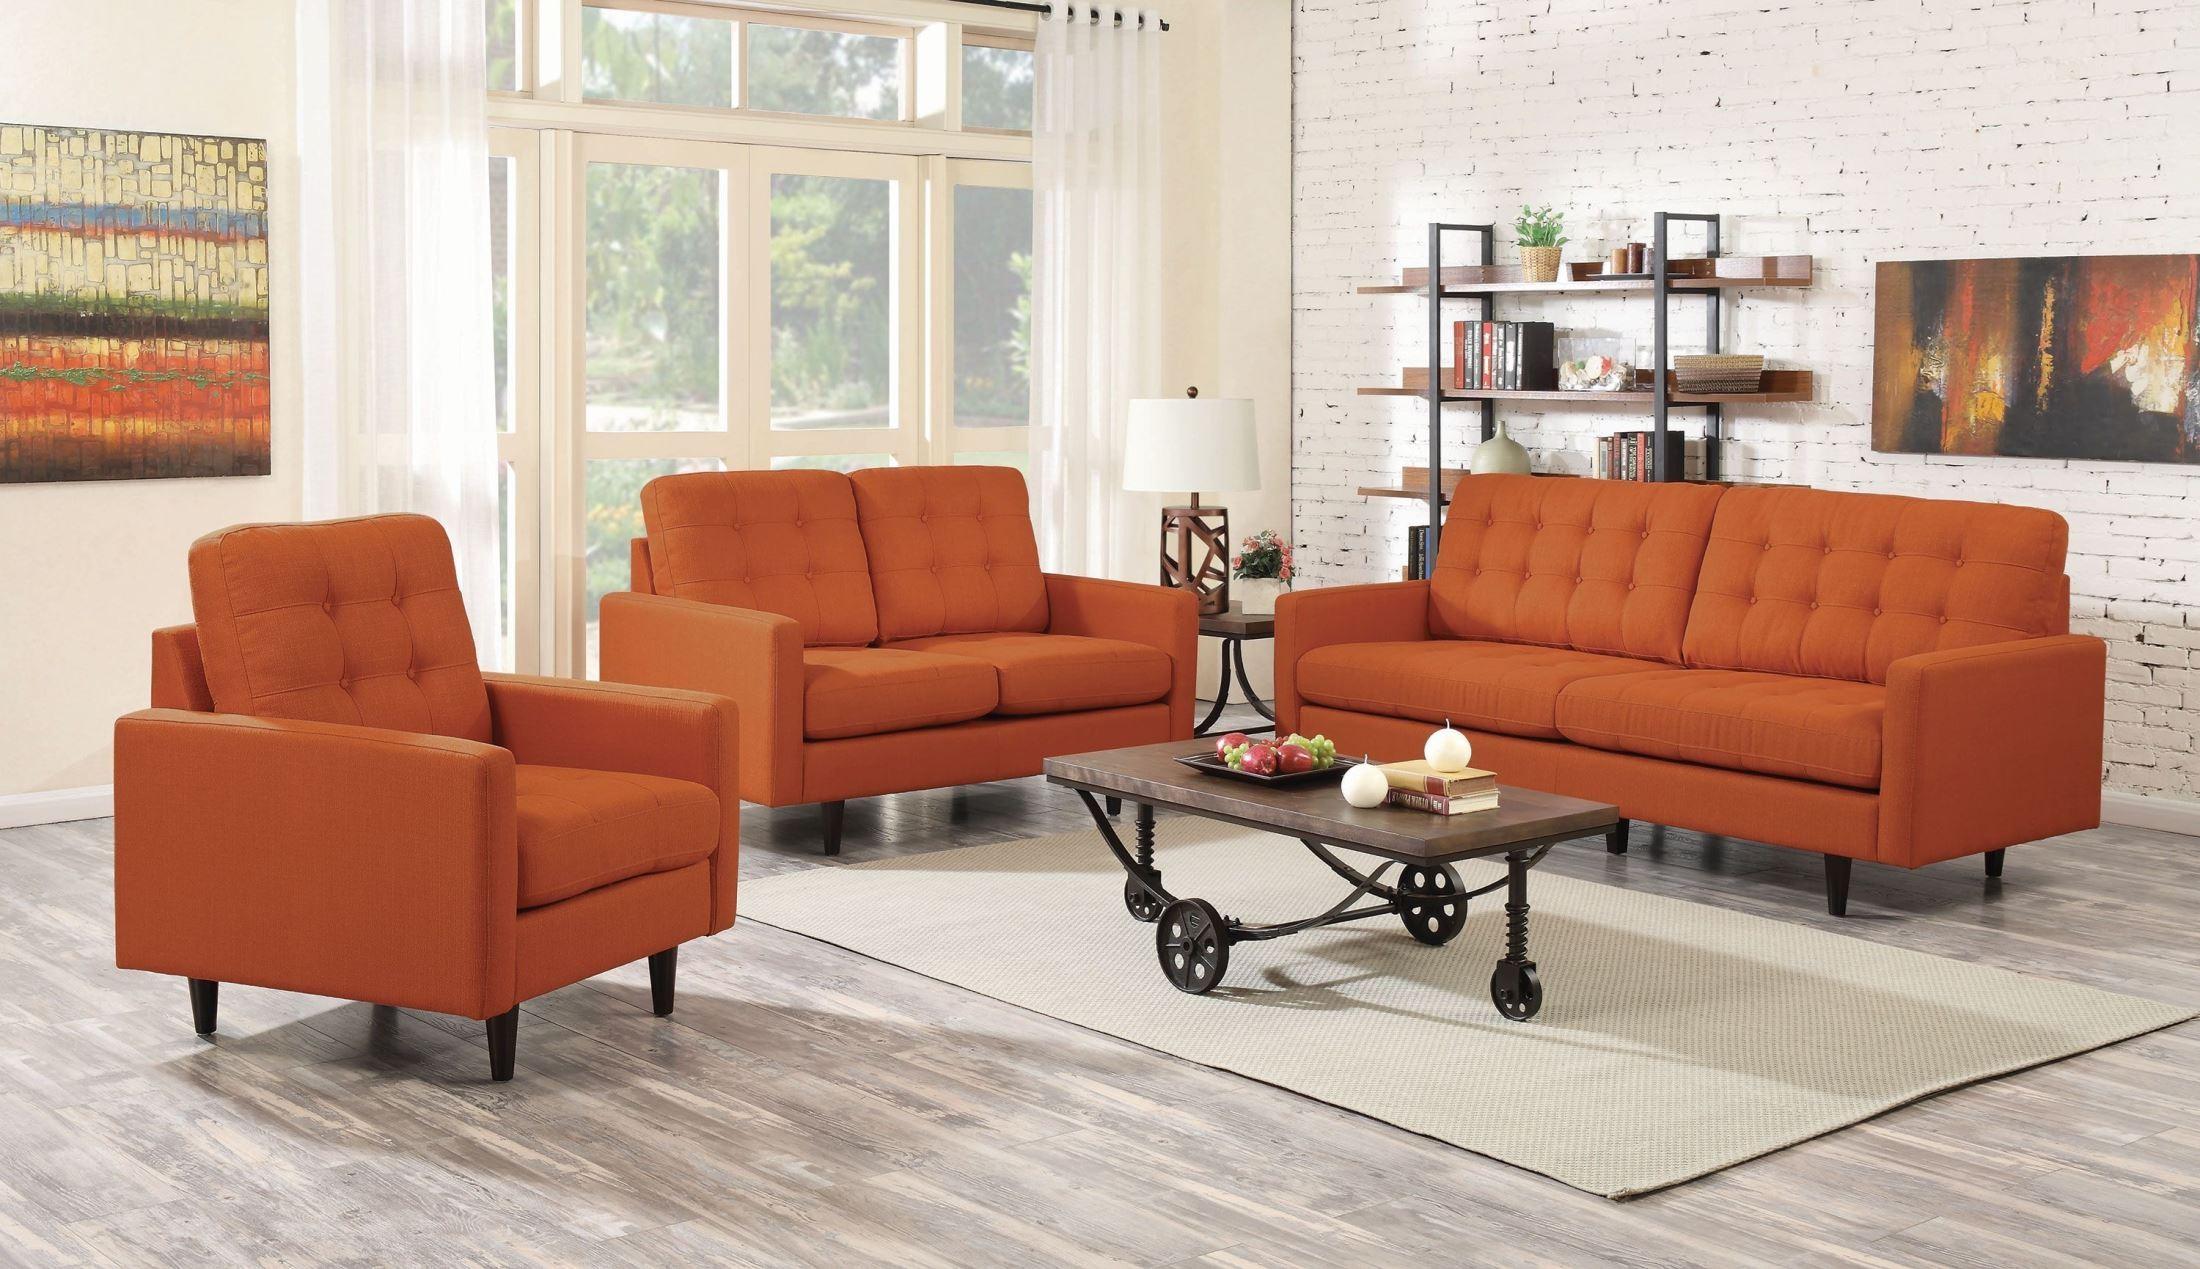 Kesson Orange Living Room Set 505371 Coaster Furniture